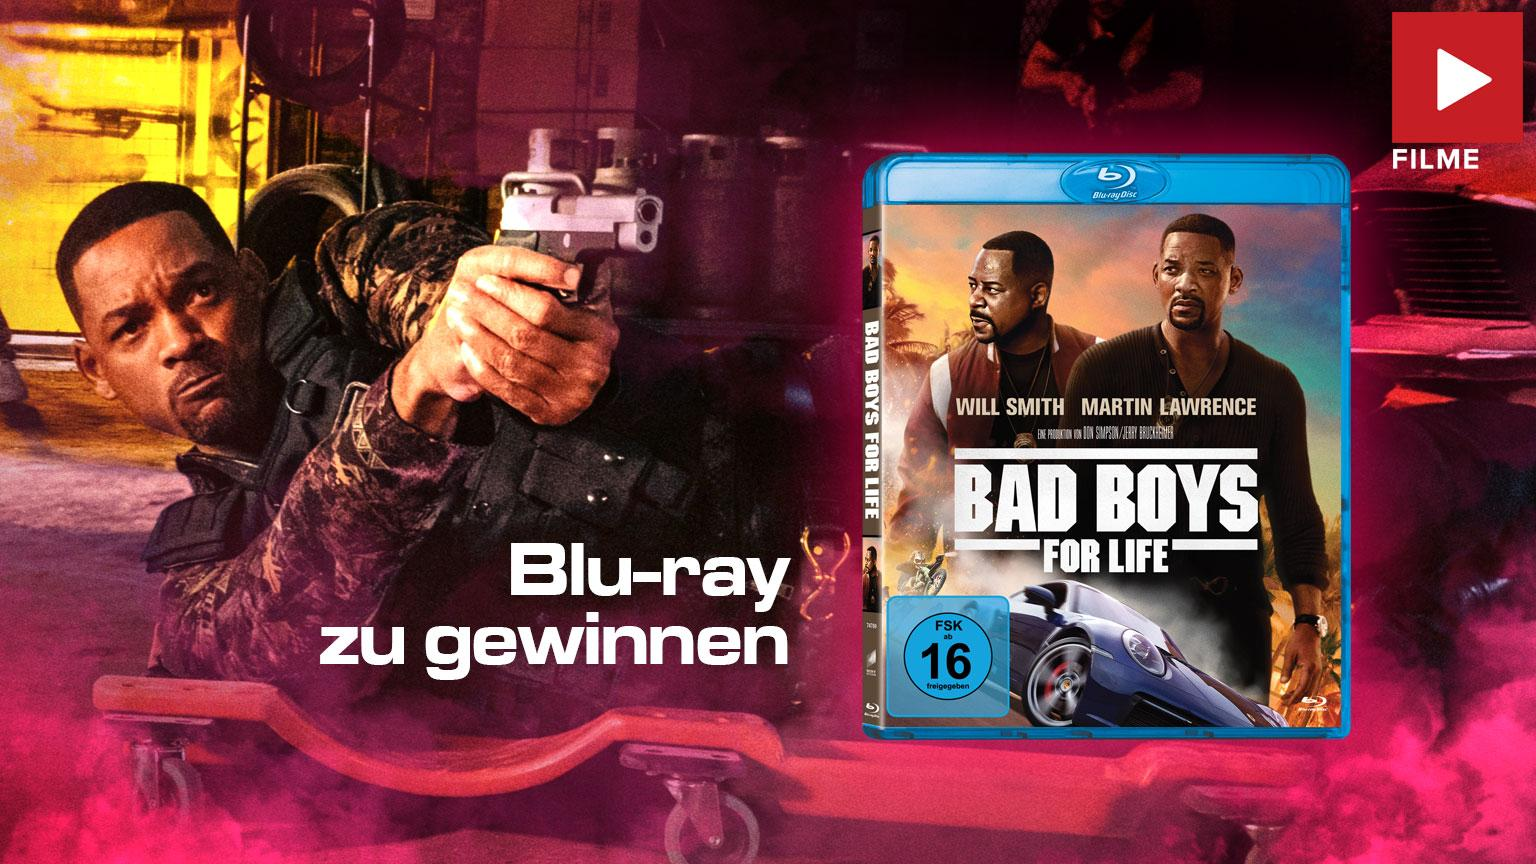 Bad Boys for Life Film 2020 Gewinnspiel Shop kaufen